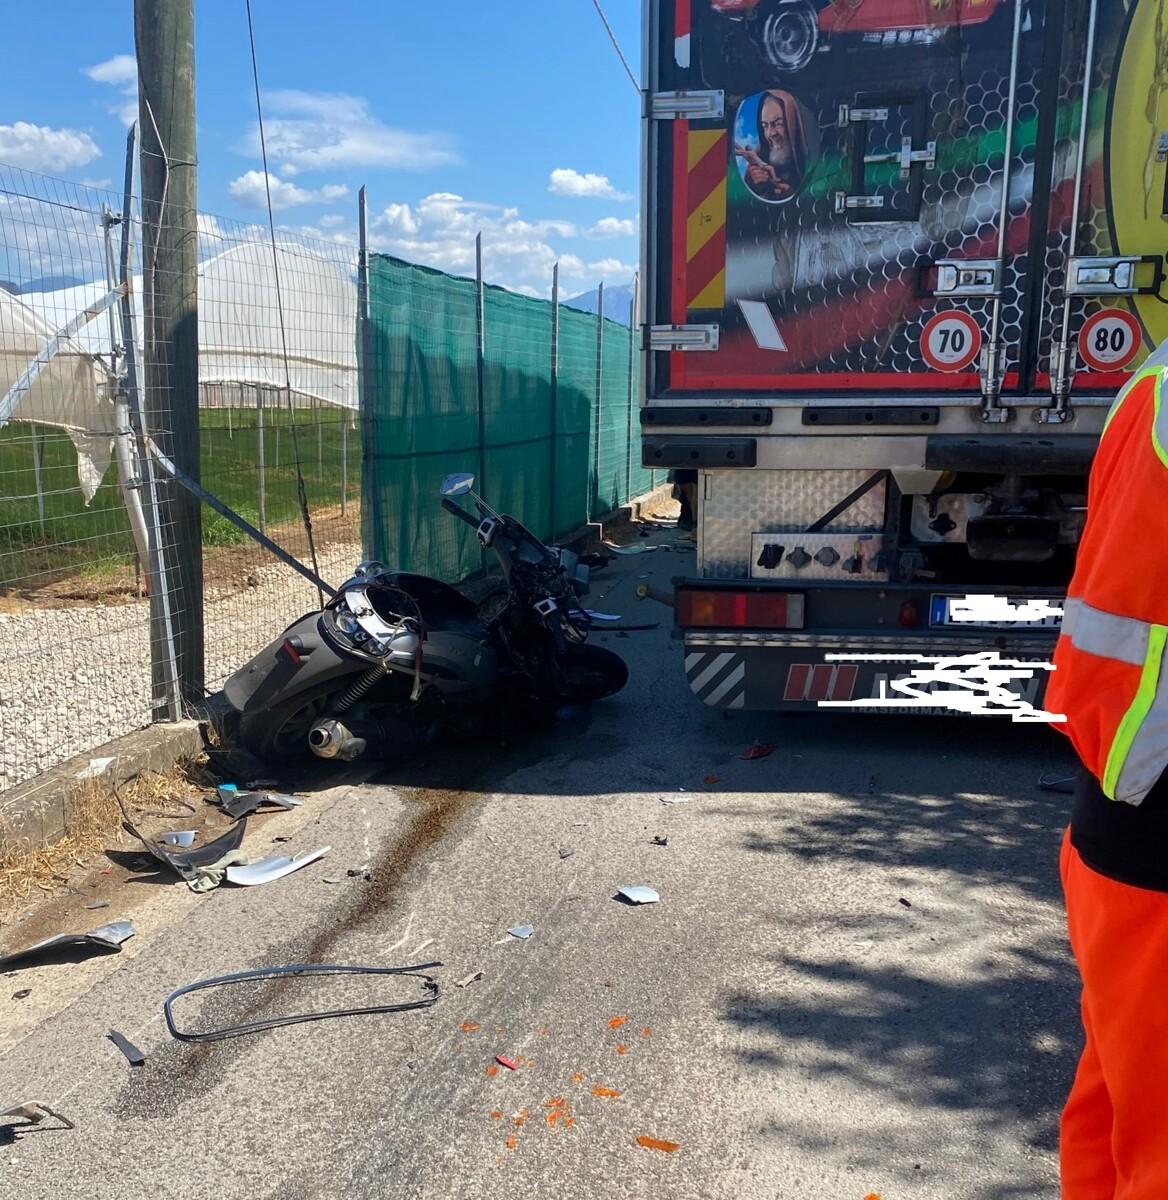 Tragico incidente stradale a Pontecagnano: muore un uomo